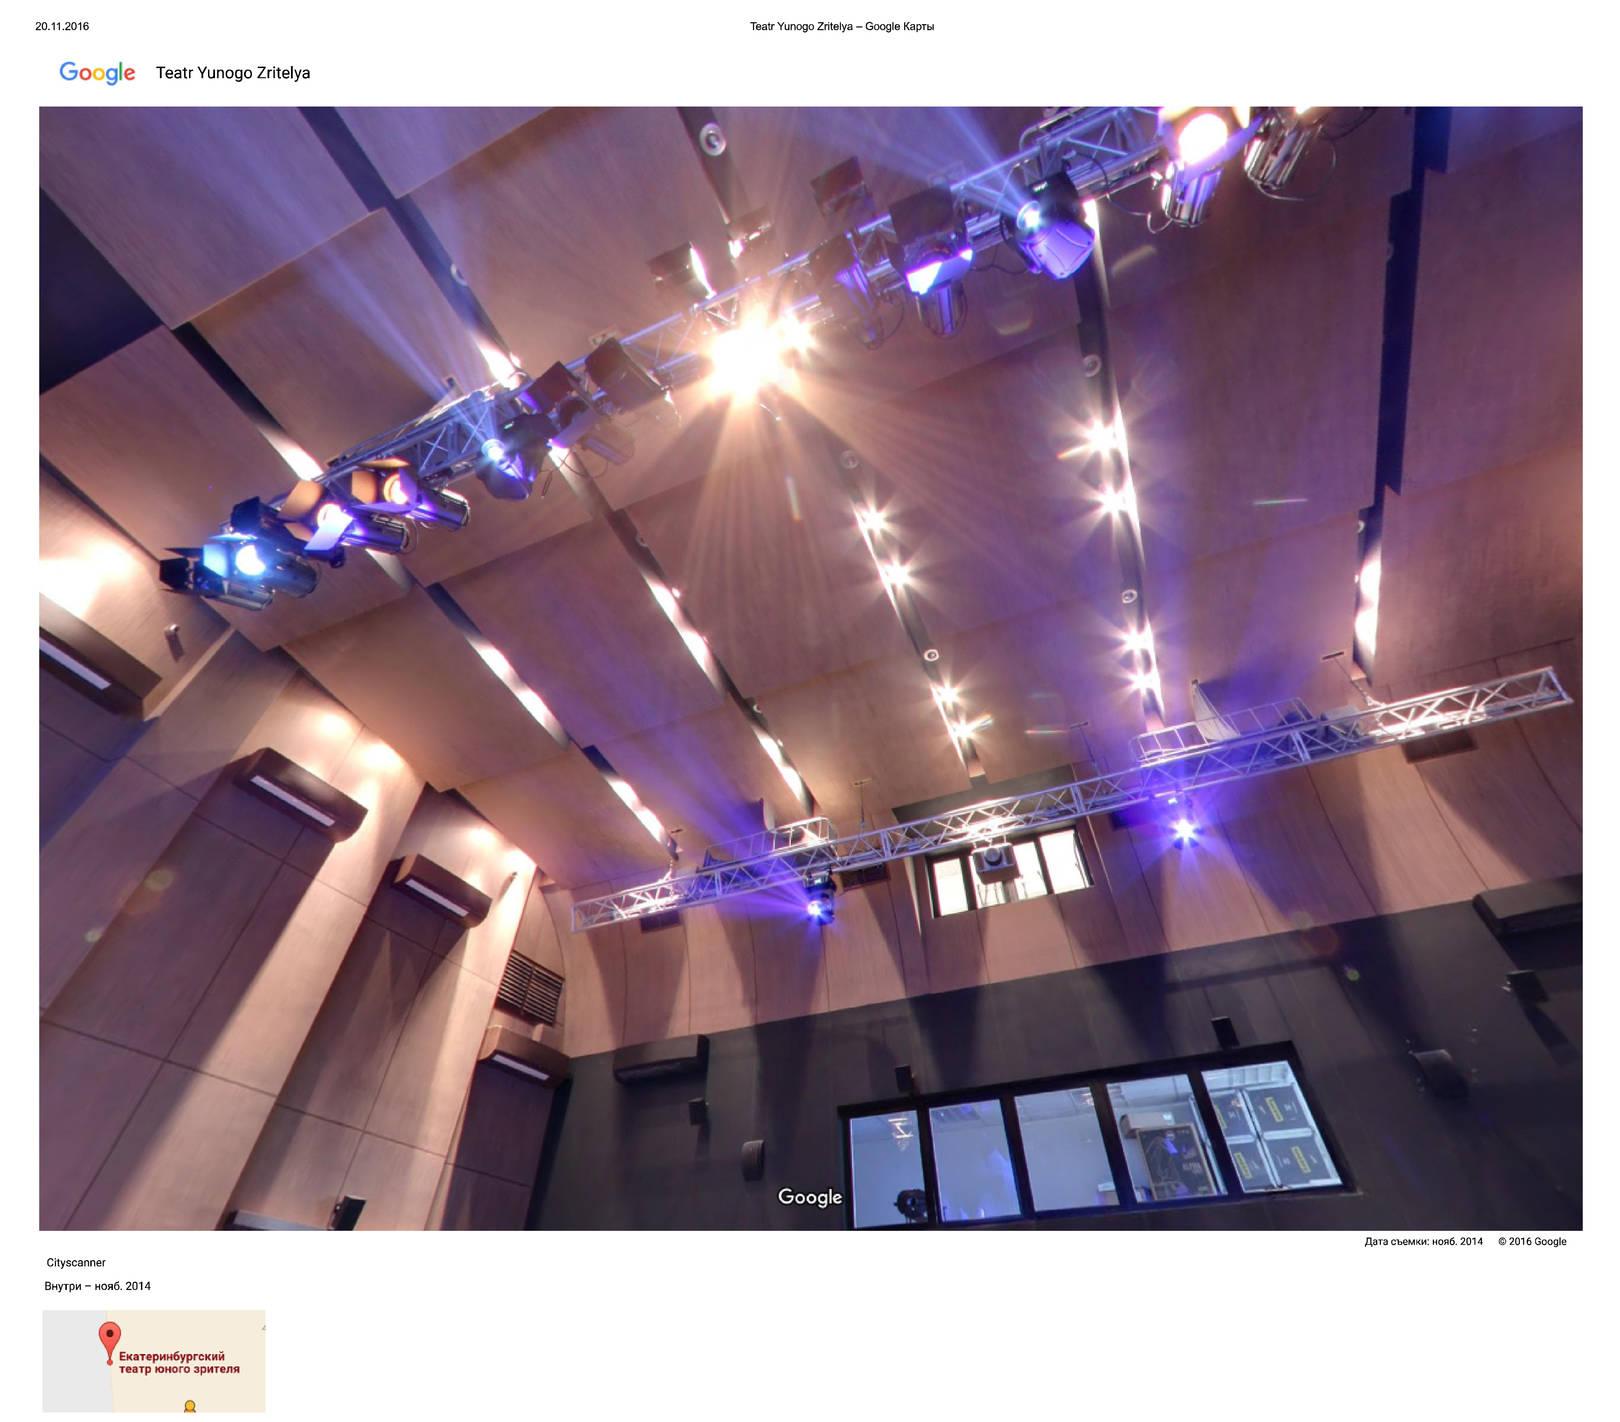 Потолок малого зала